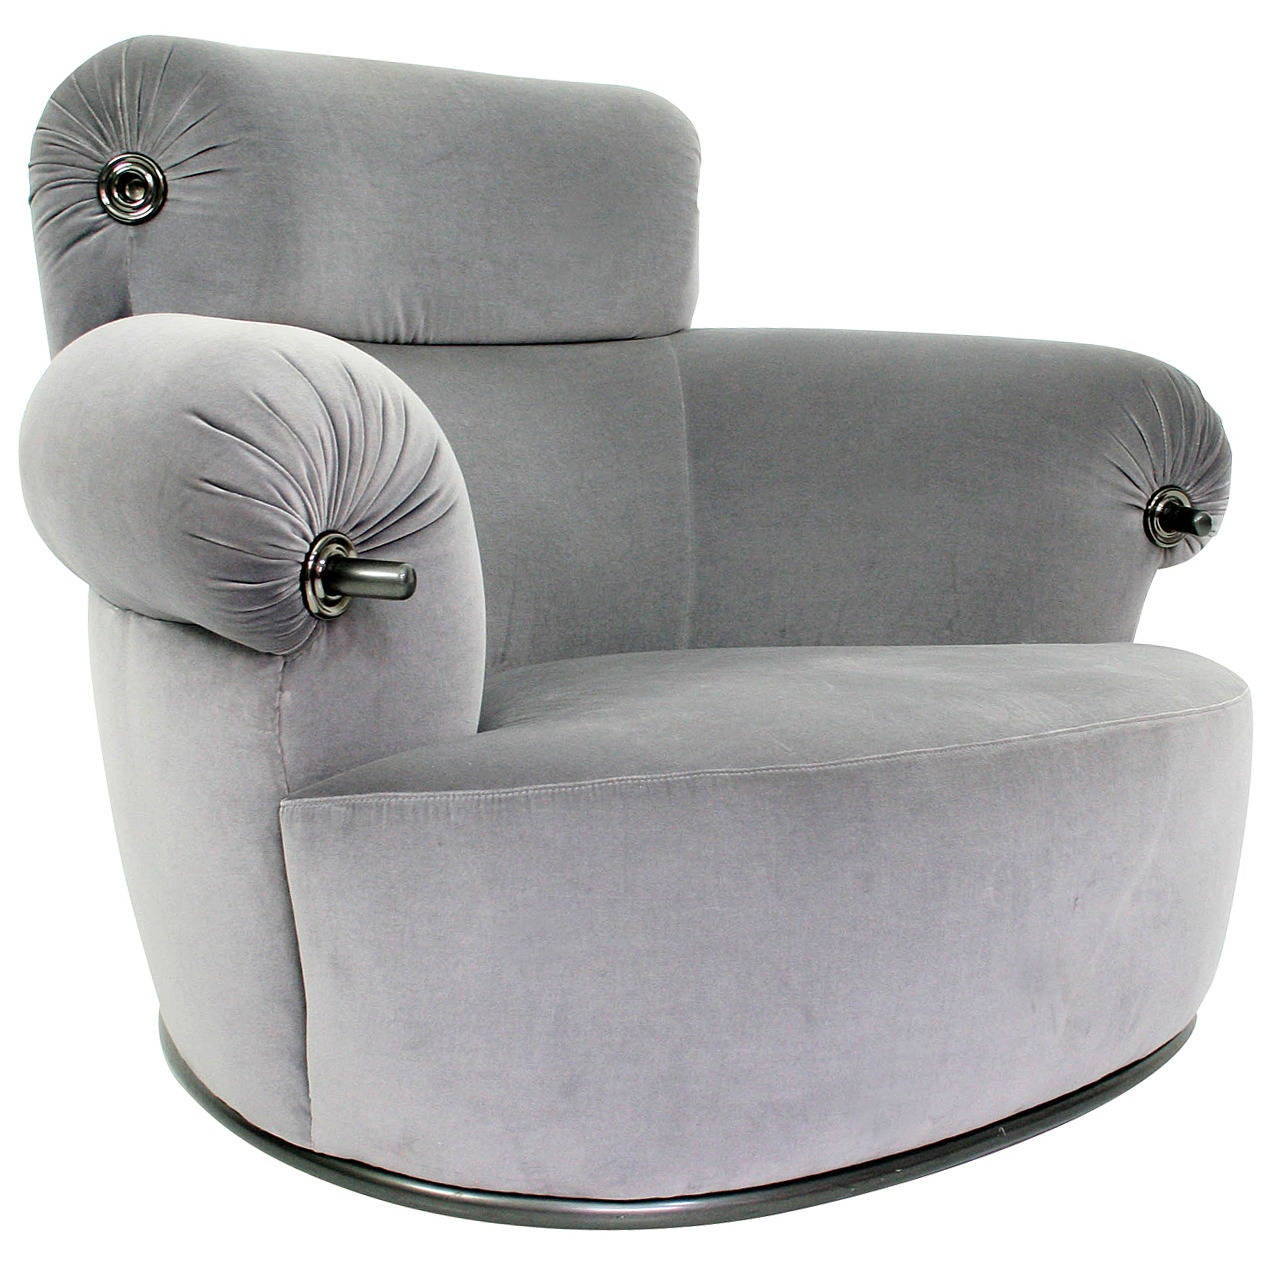 Luigi Caccia Dominioni Azucena Toro Lounge Chair 1973 at 1stdibs